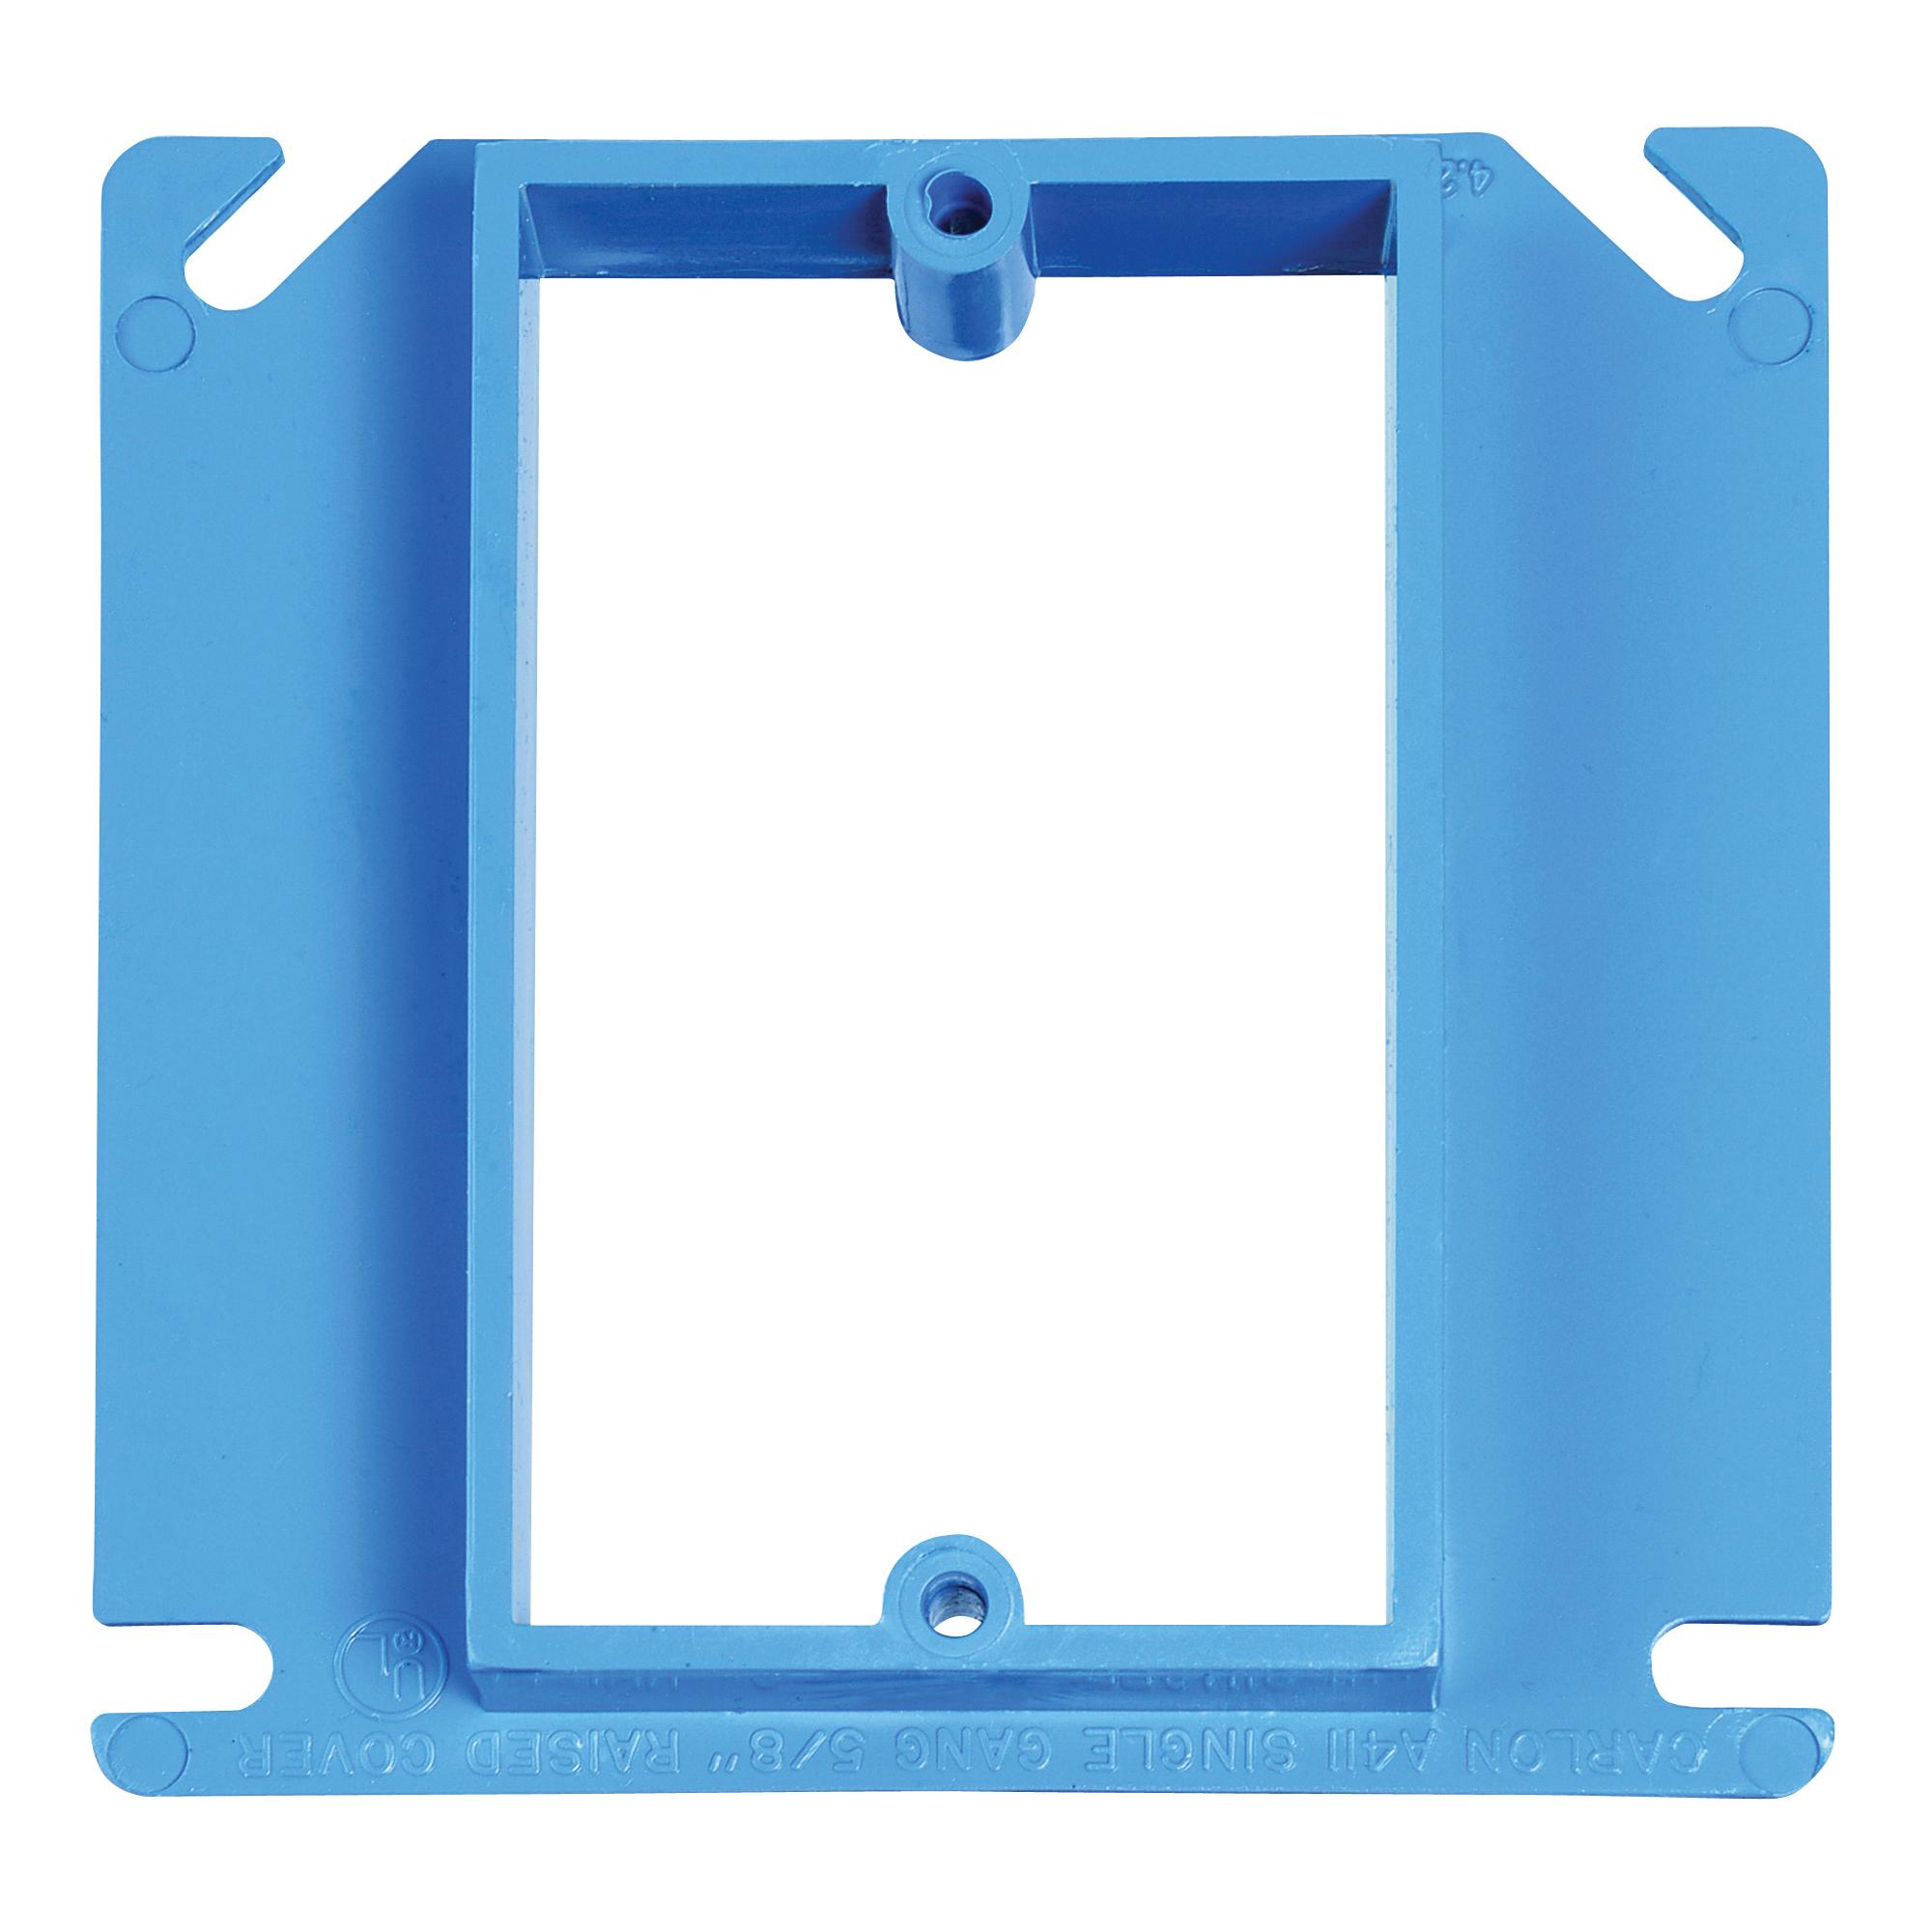 Picture of Carlon A410R-CAR Electrical Box Cover, 4 in L, 4 in W, Square, PVC, Blue